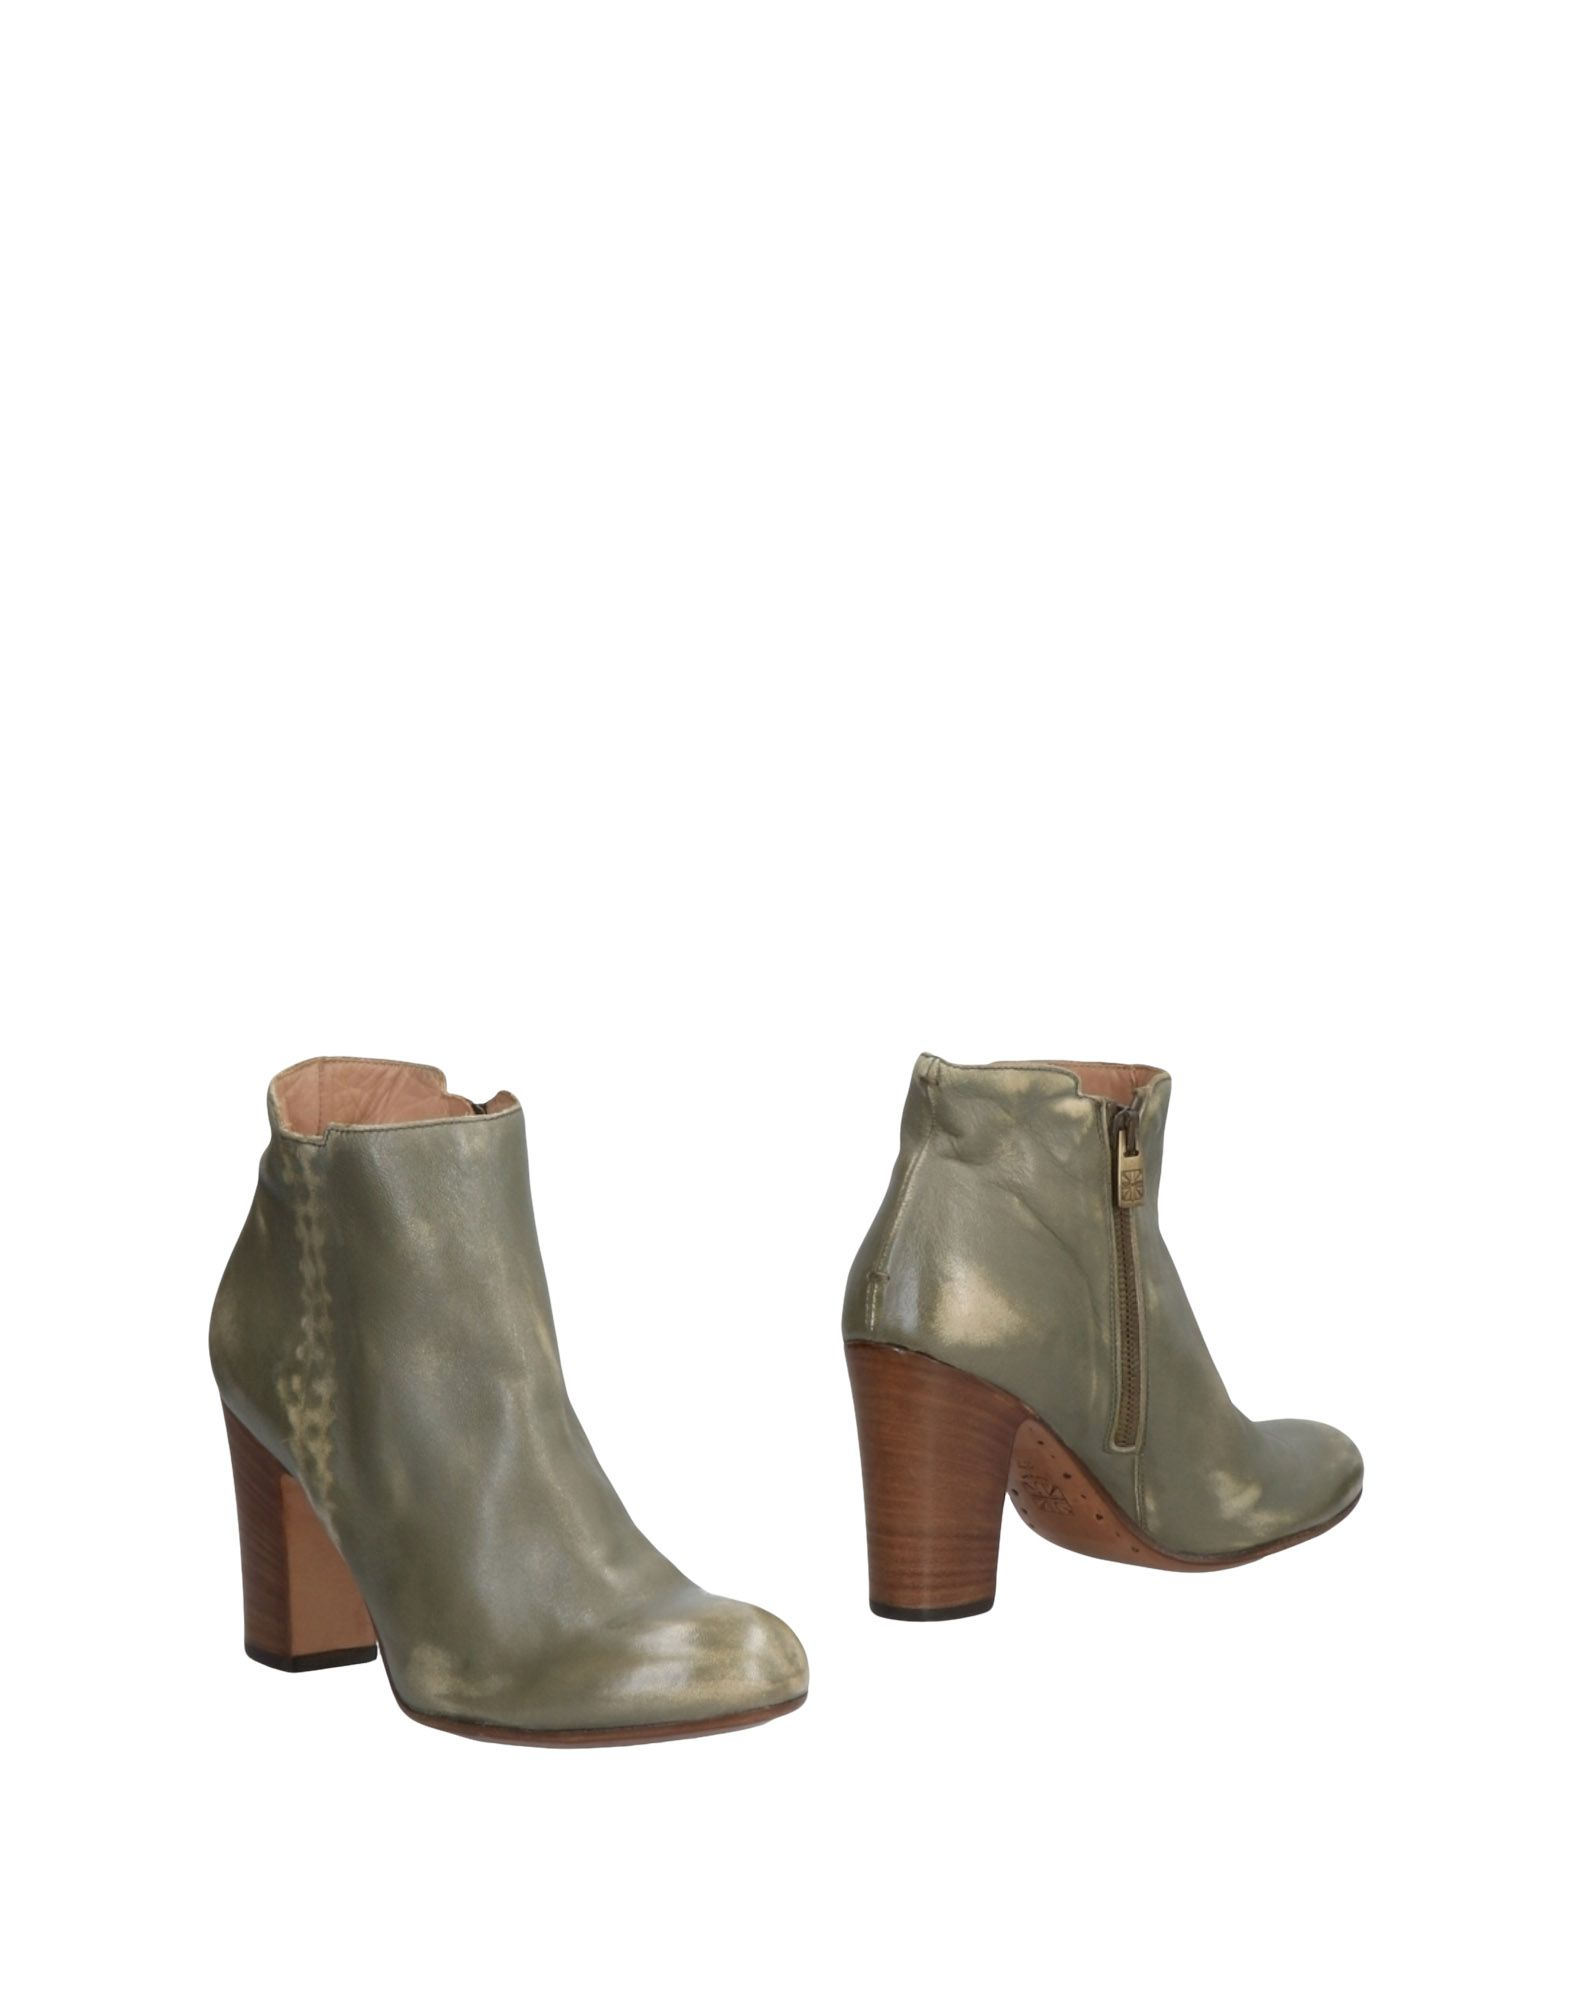 Pantanetti Ankle Boot - Women Women Women Pantanetti Ankle Boots online on  United Kingdom - 11468085GK 2dfaca